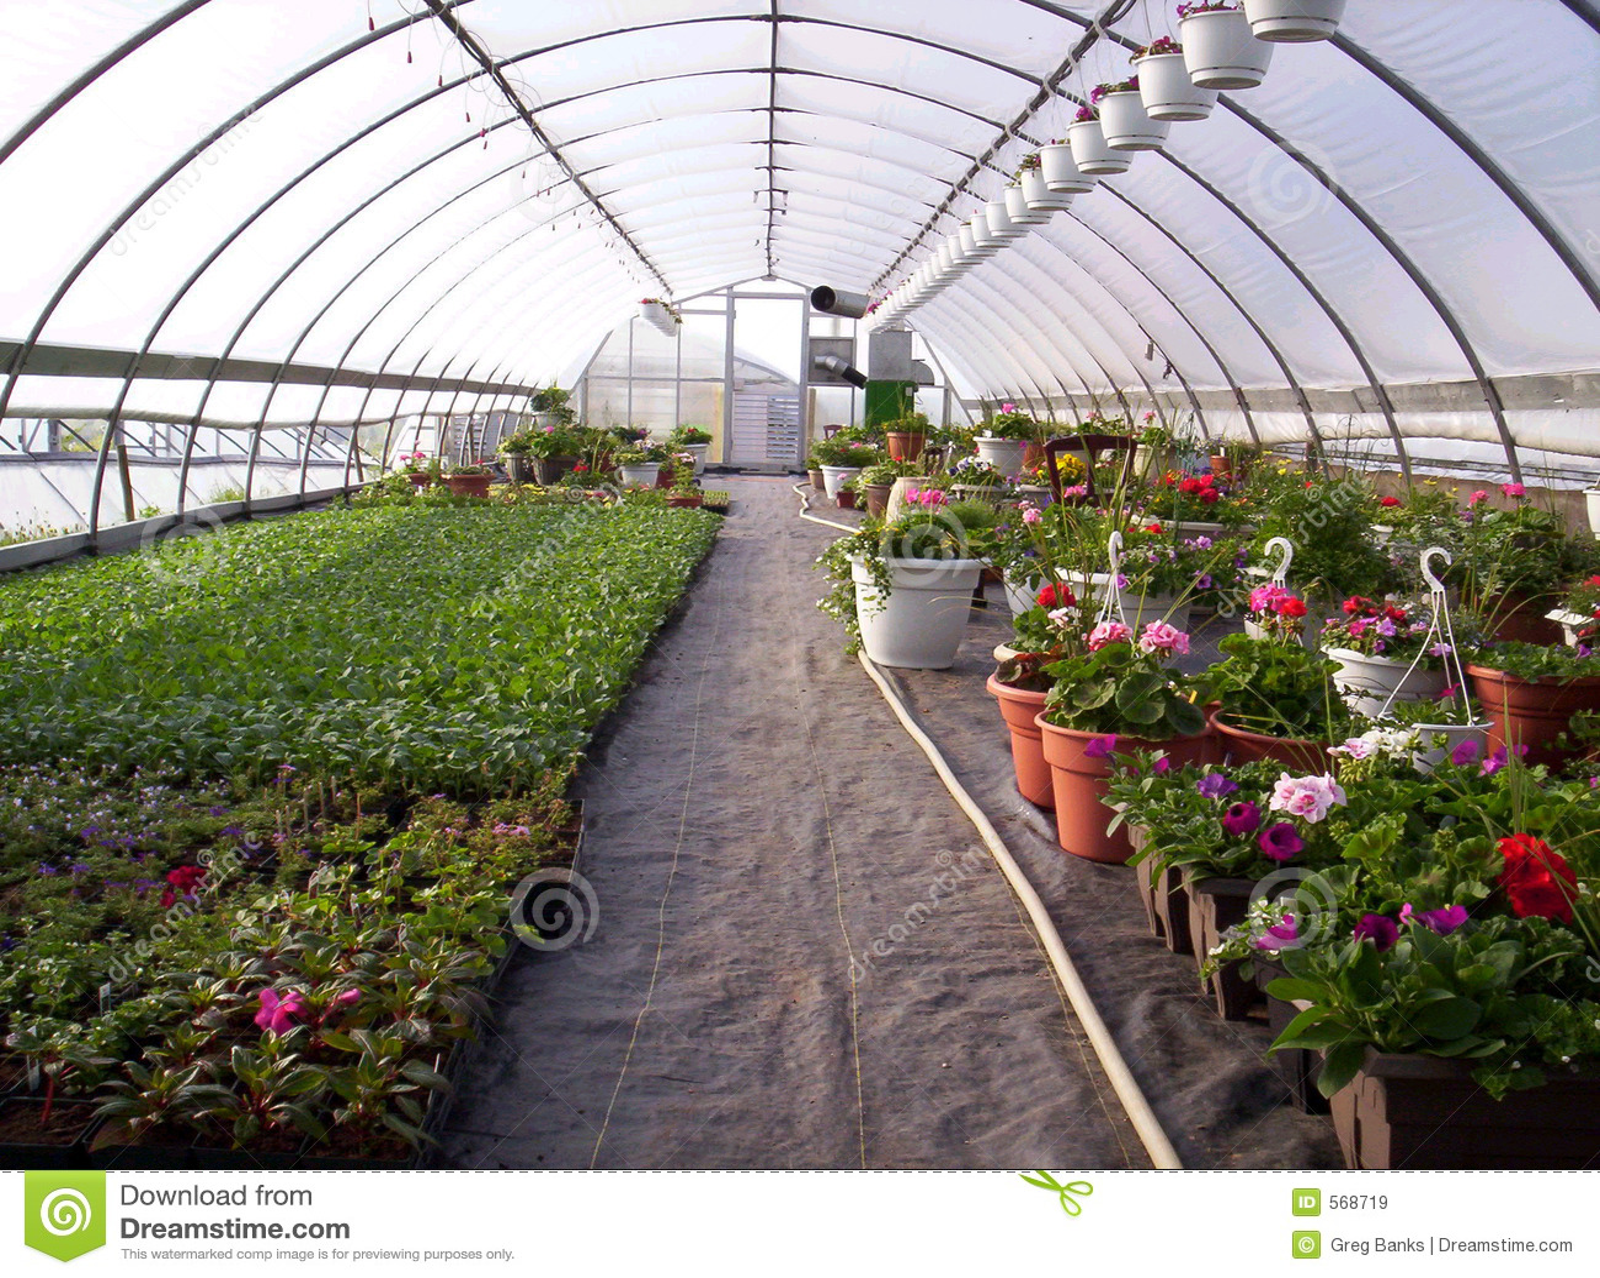 greenhouse business plan